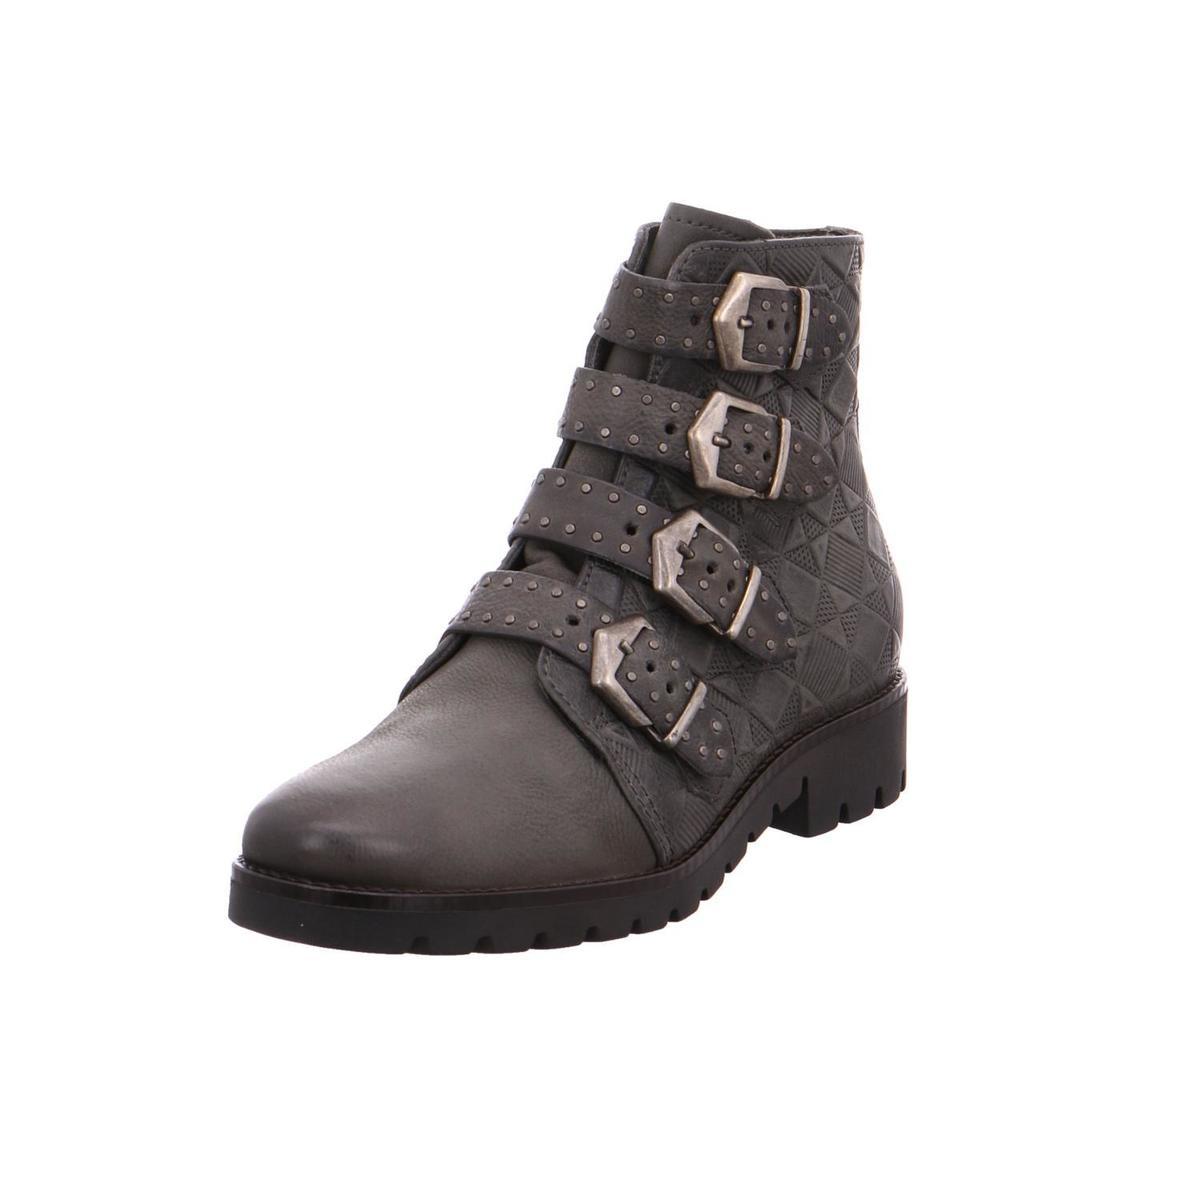 Mjus - 192218 grau - Schuhe Low Boots Damen 119,95 €